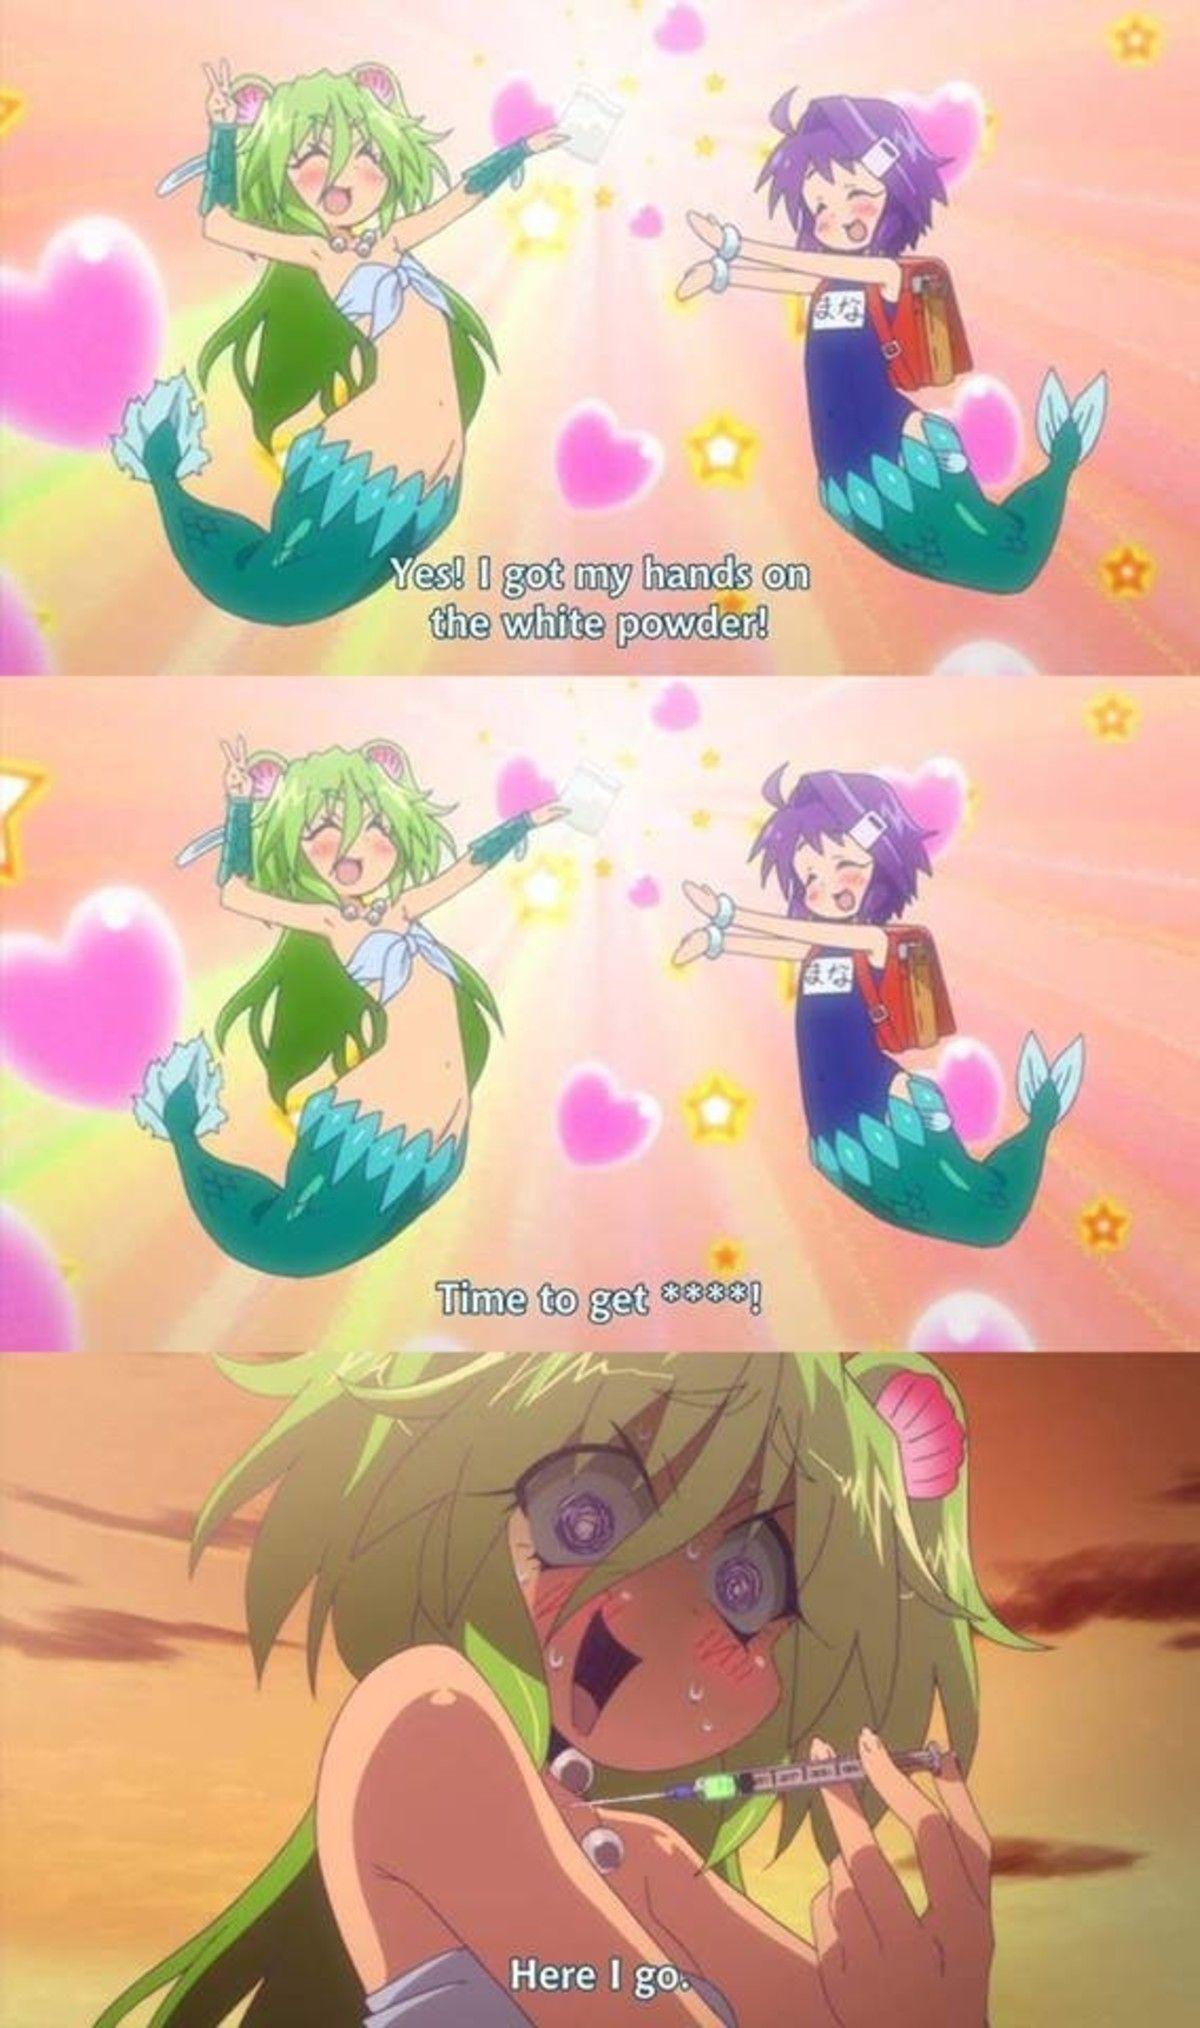 Muromi-san is insane